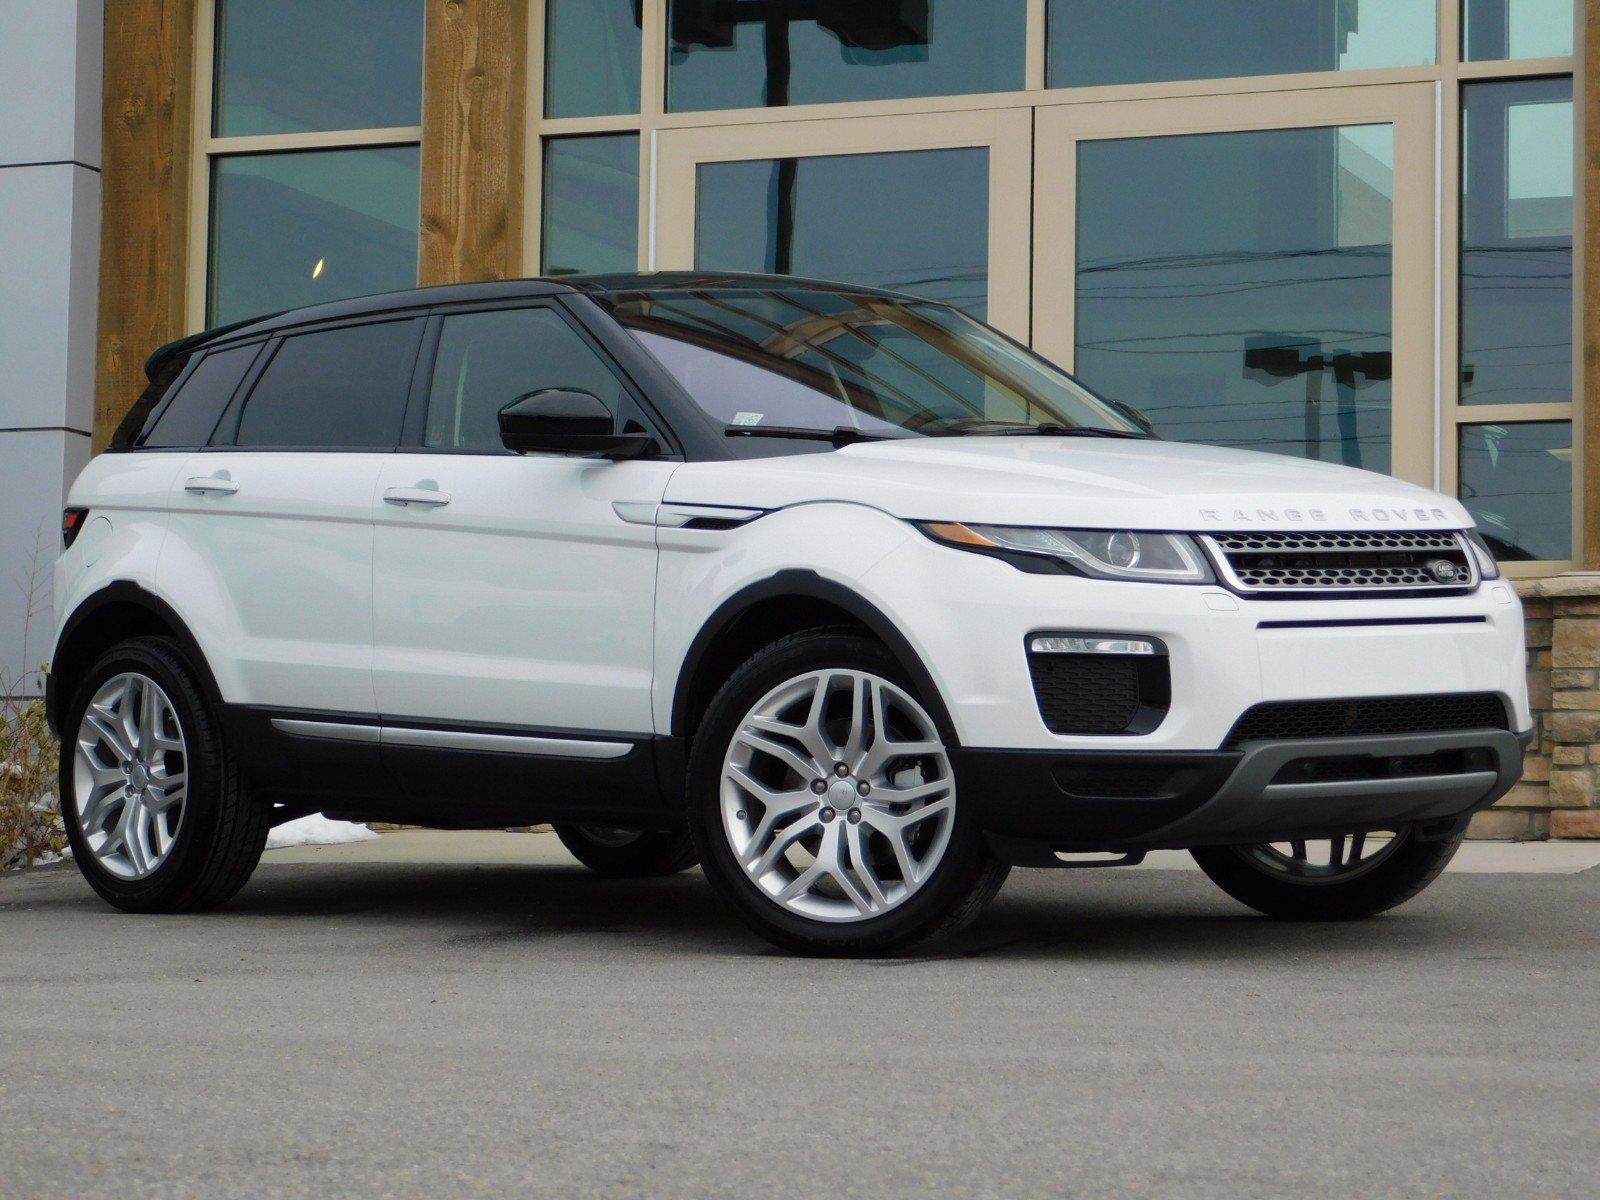 Range Rover Evoque >> New 2019 Land Rover Range Rover Evoque Hse Sport Utility 2r9064